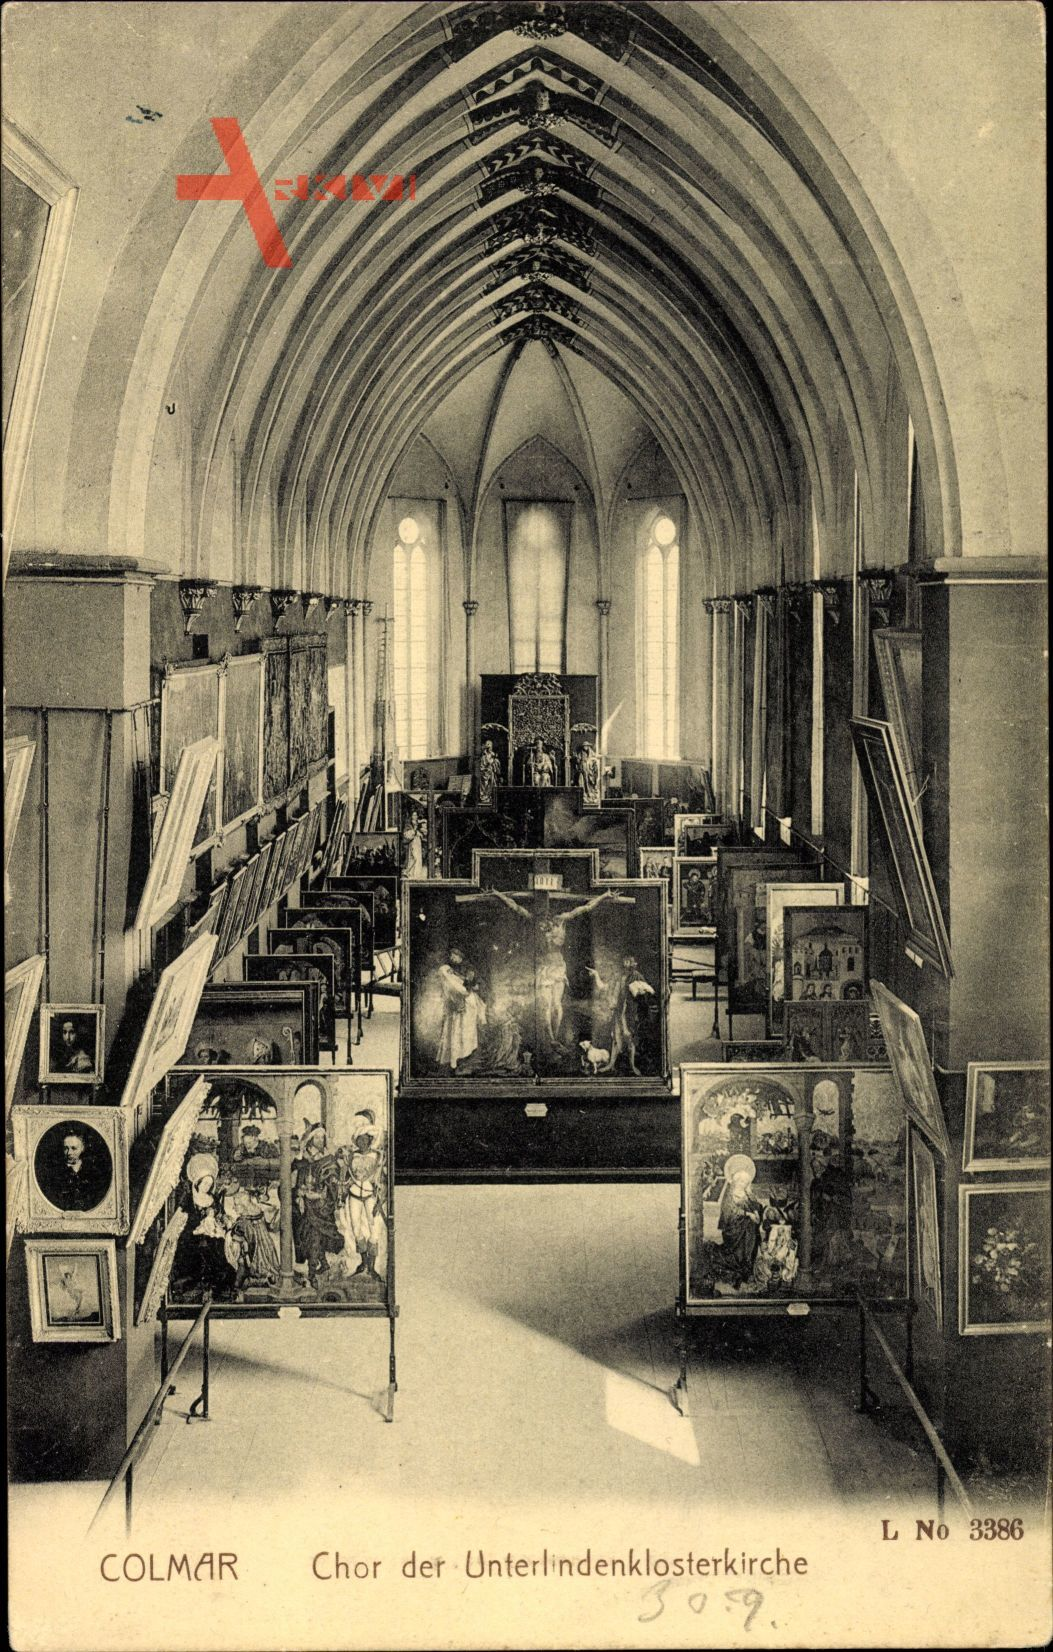 Colmar Kolmar Elsass Haut Rhin, Chor der Unterlinden Klosterkirche, Isenheimer Altar, Grünewald